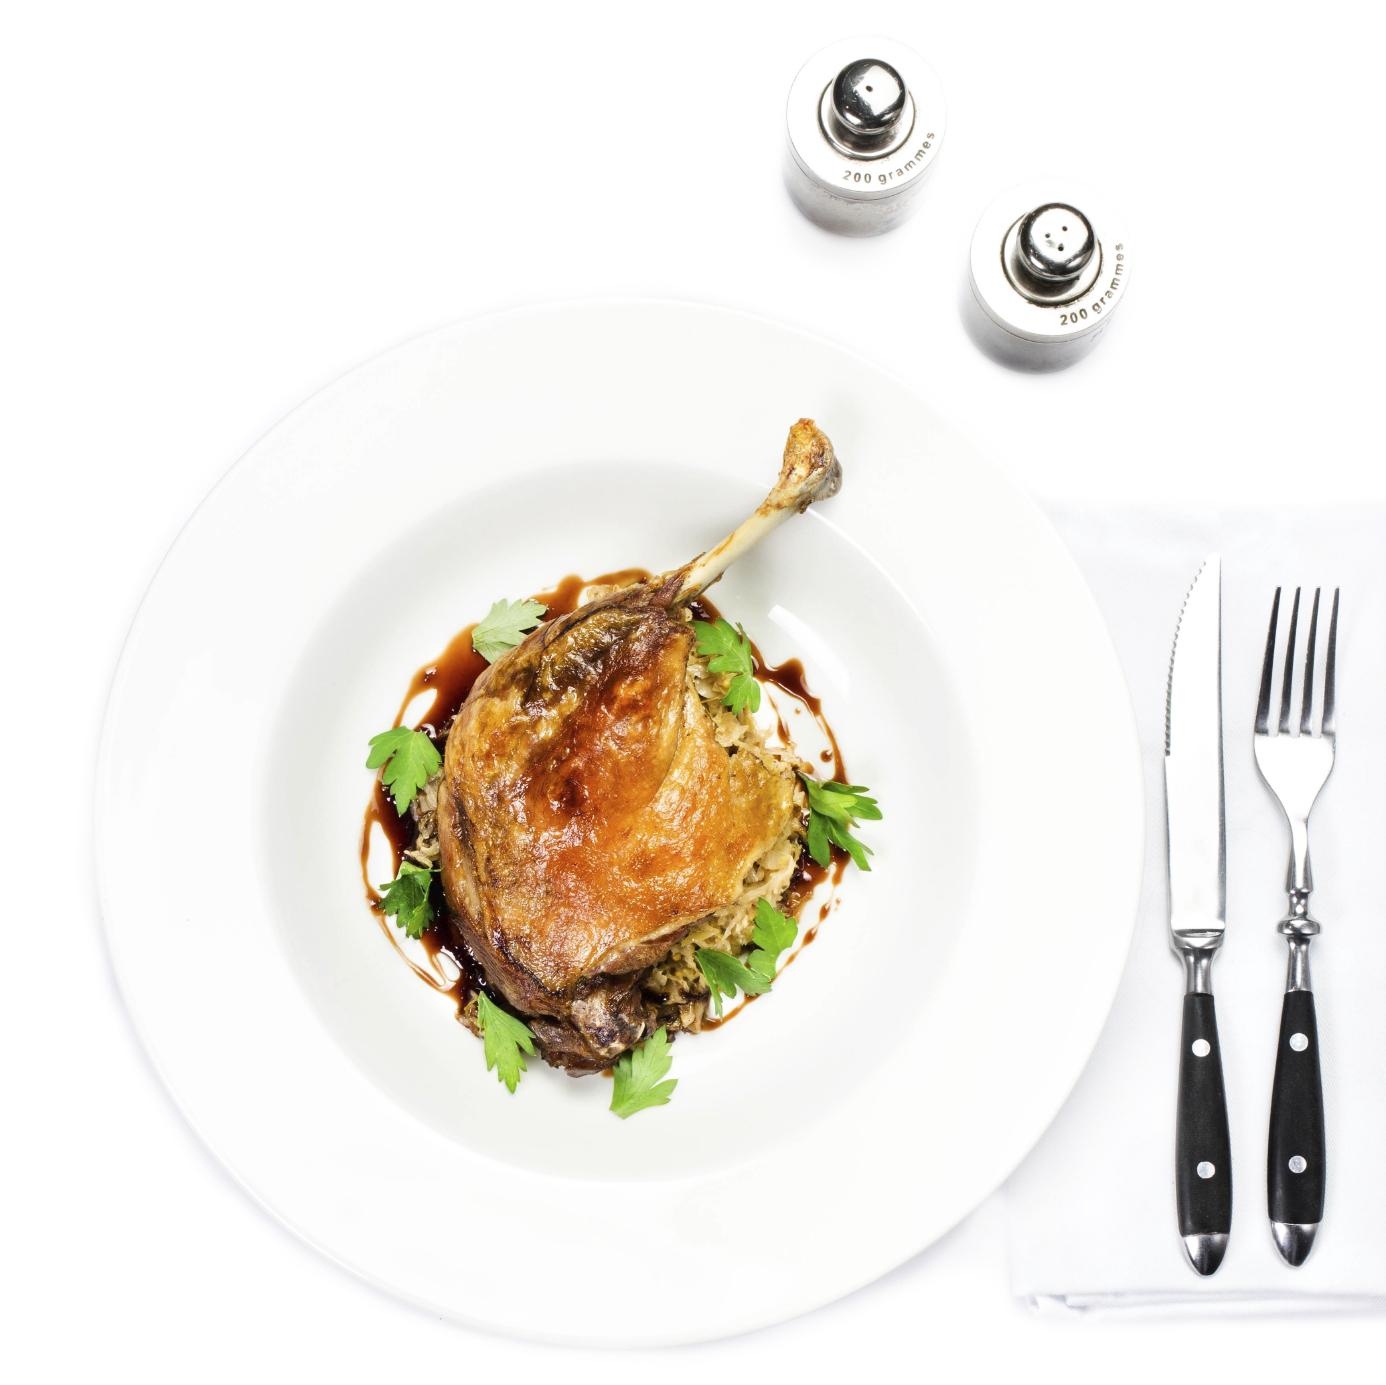 Confit de pato con salsa de manzana